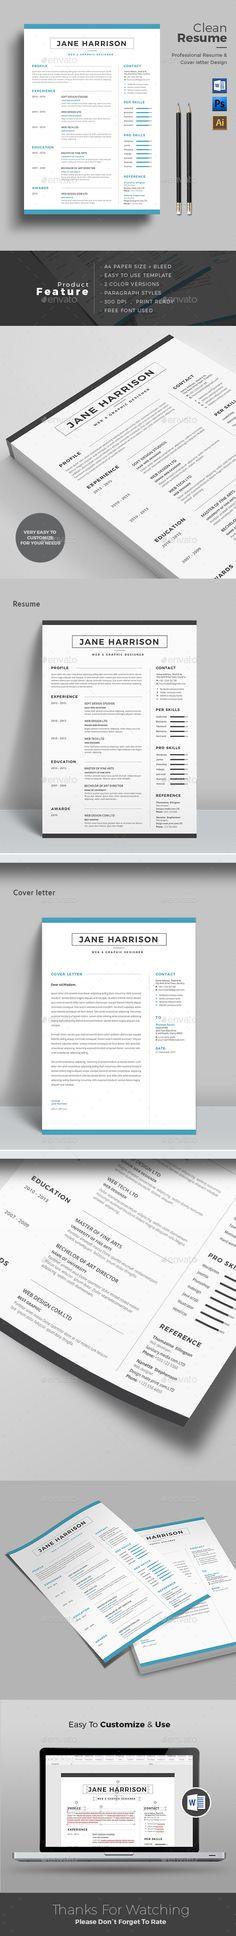 Resume/CV - Sam Resume cv, Cover letter template and Cv cover letter - resume download